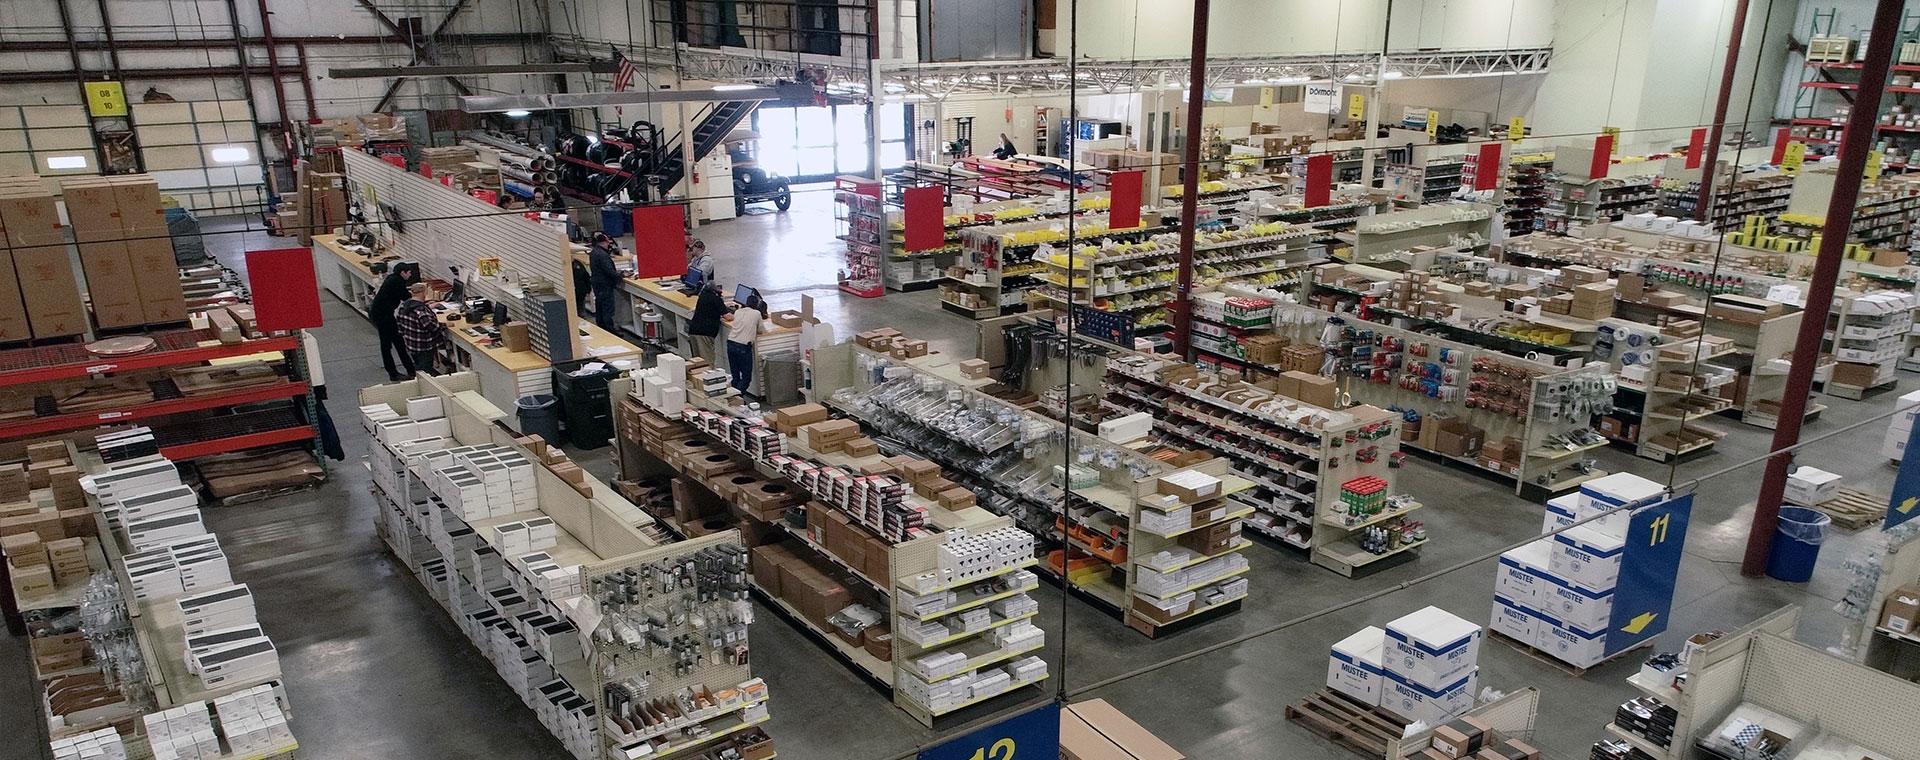 RWCO_Reeves-Wiedeman-Company-Wholesale-Plumbing-Supplies_draft-1a